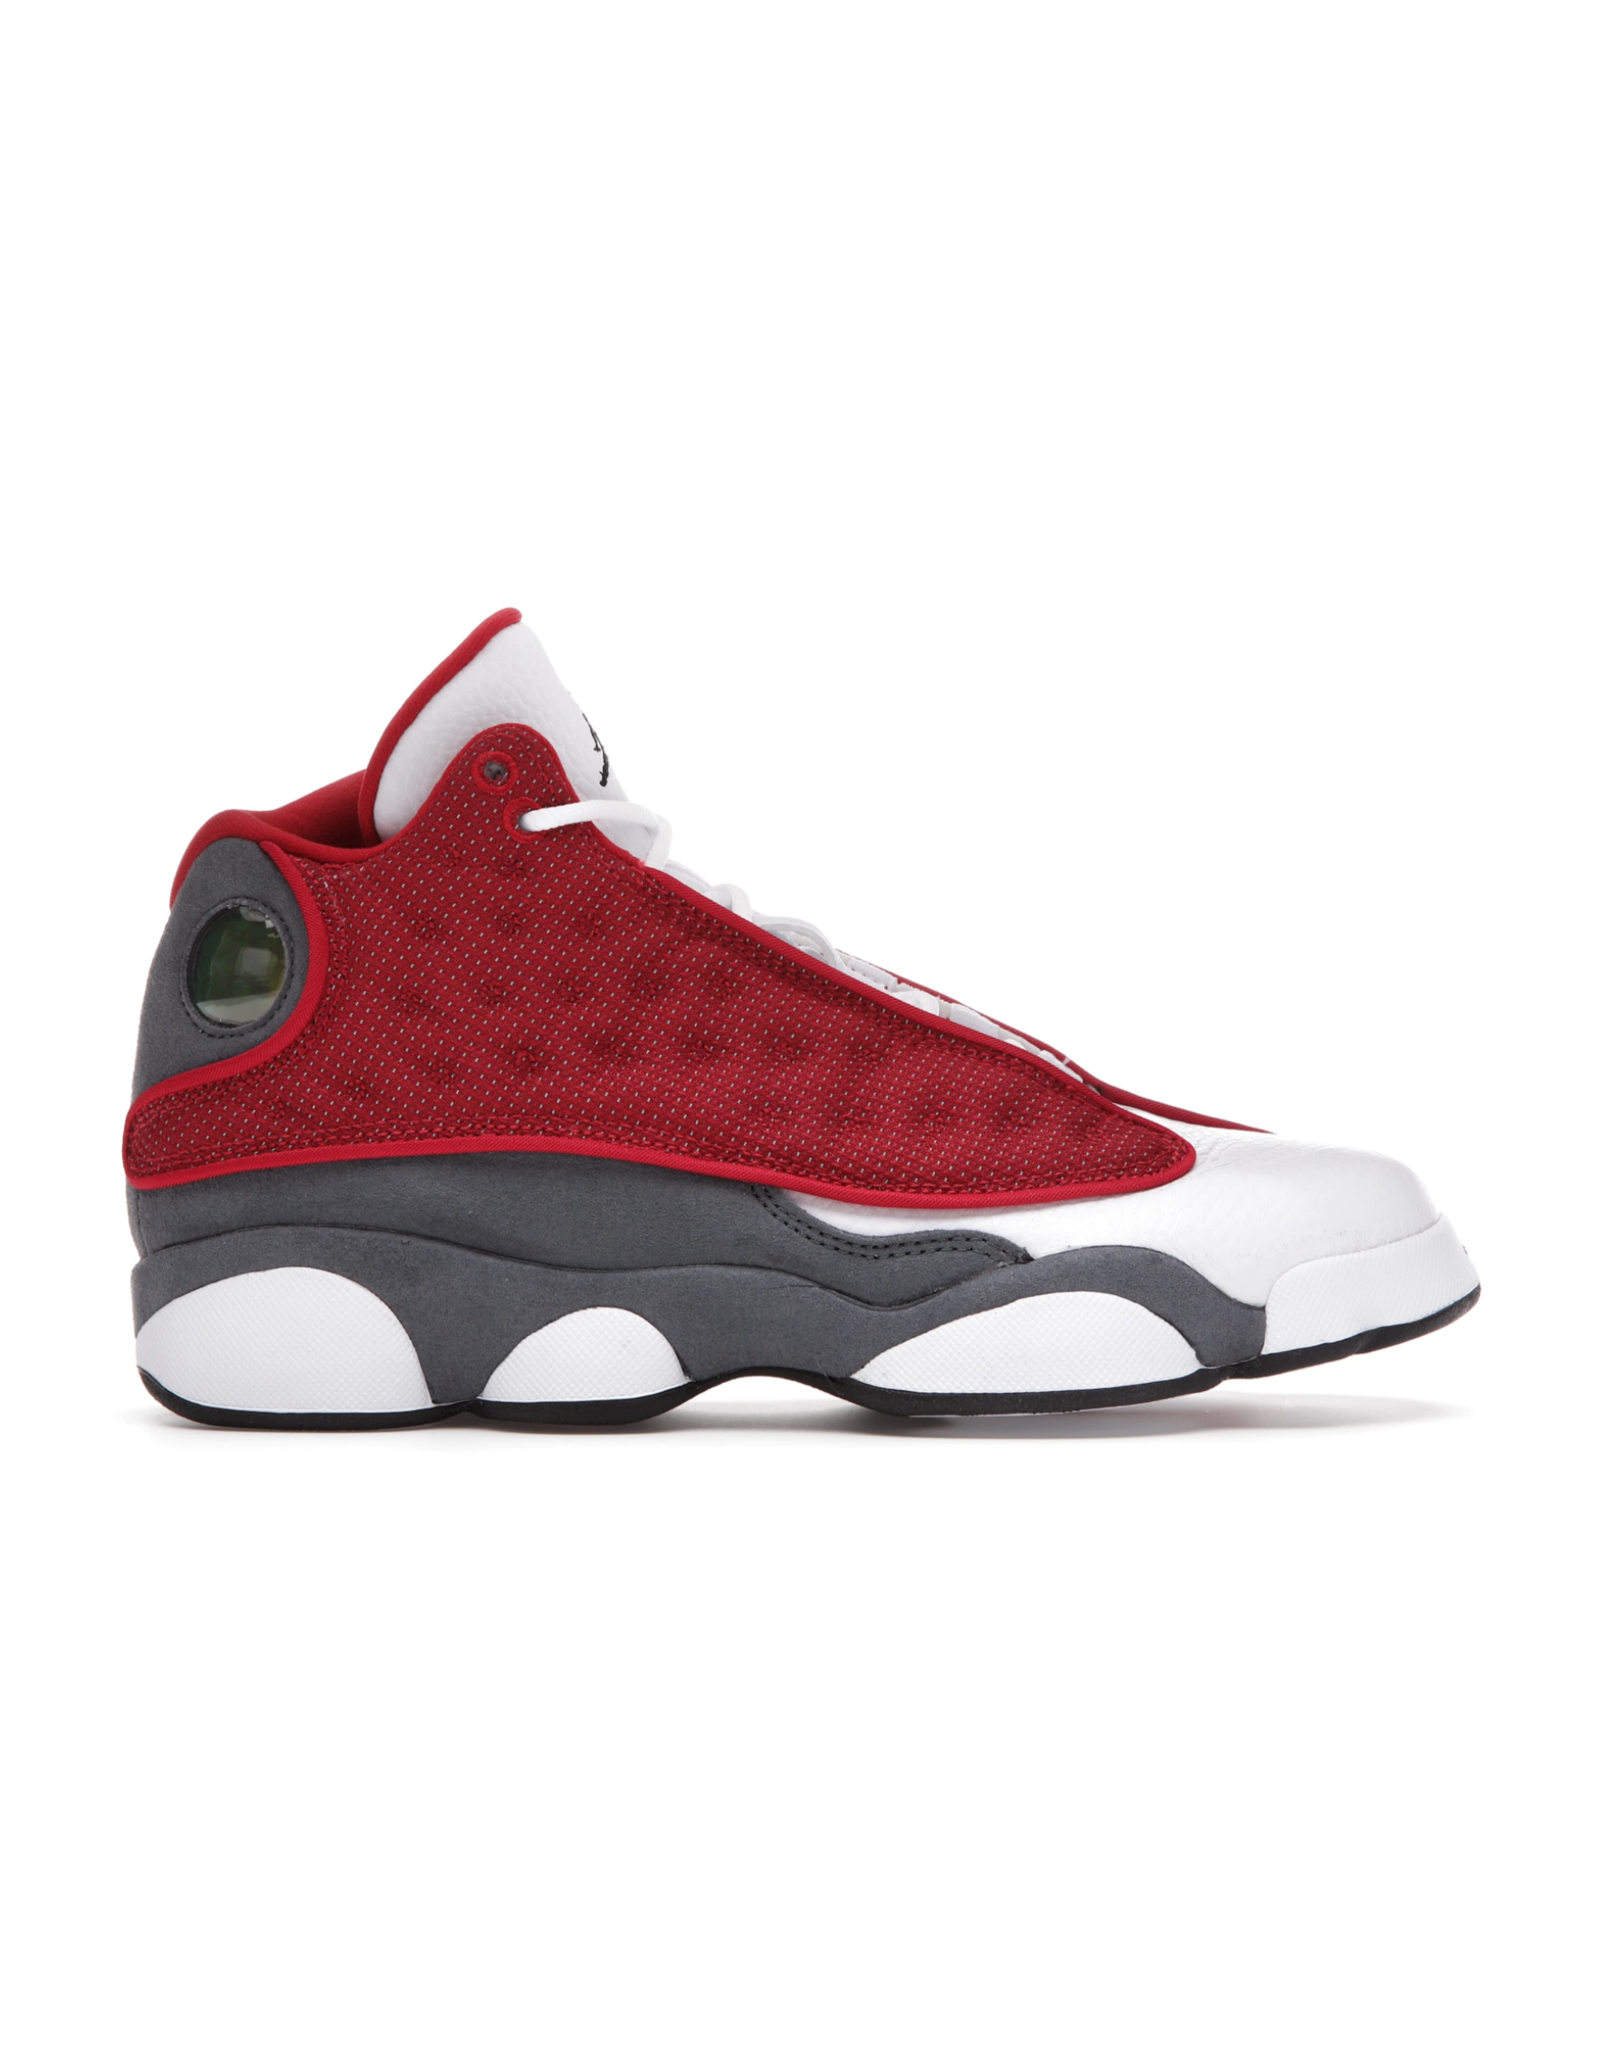 JORDAN Jordan 13 Retro Gym Red Flint Grey (GS)